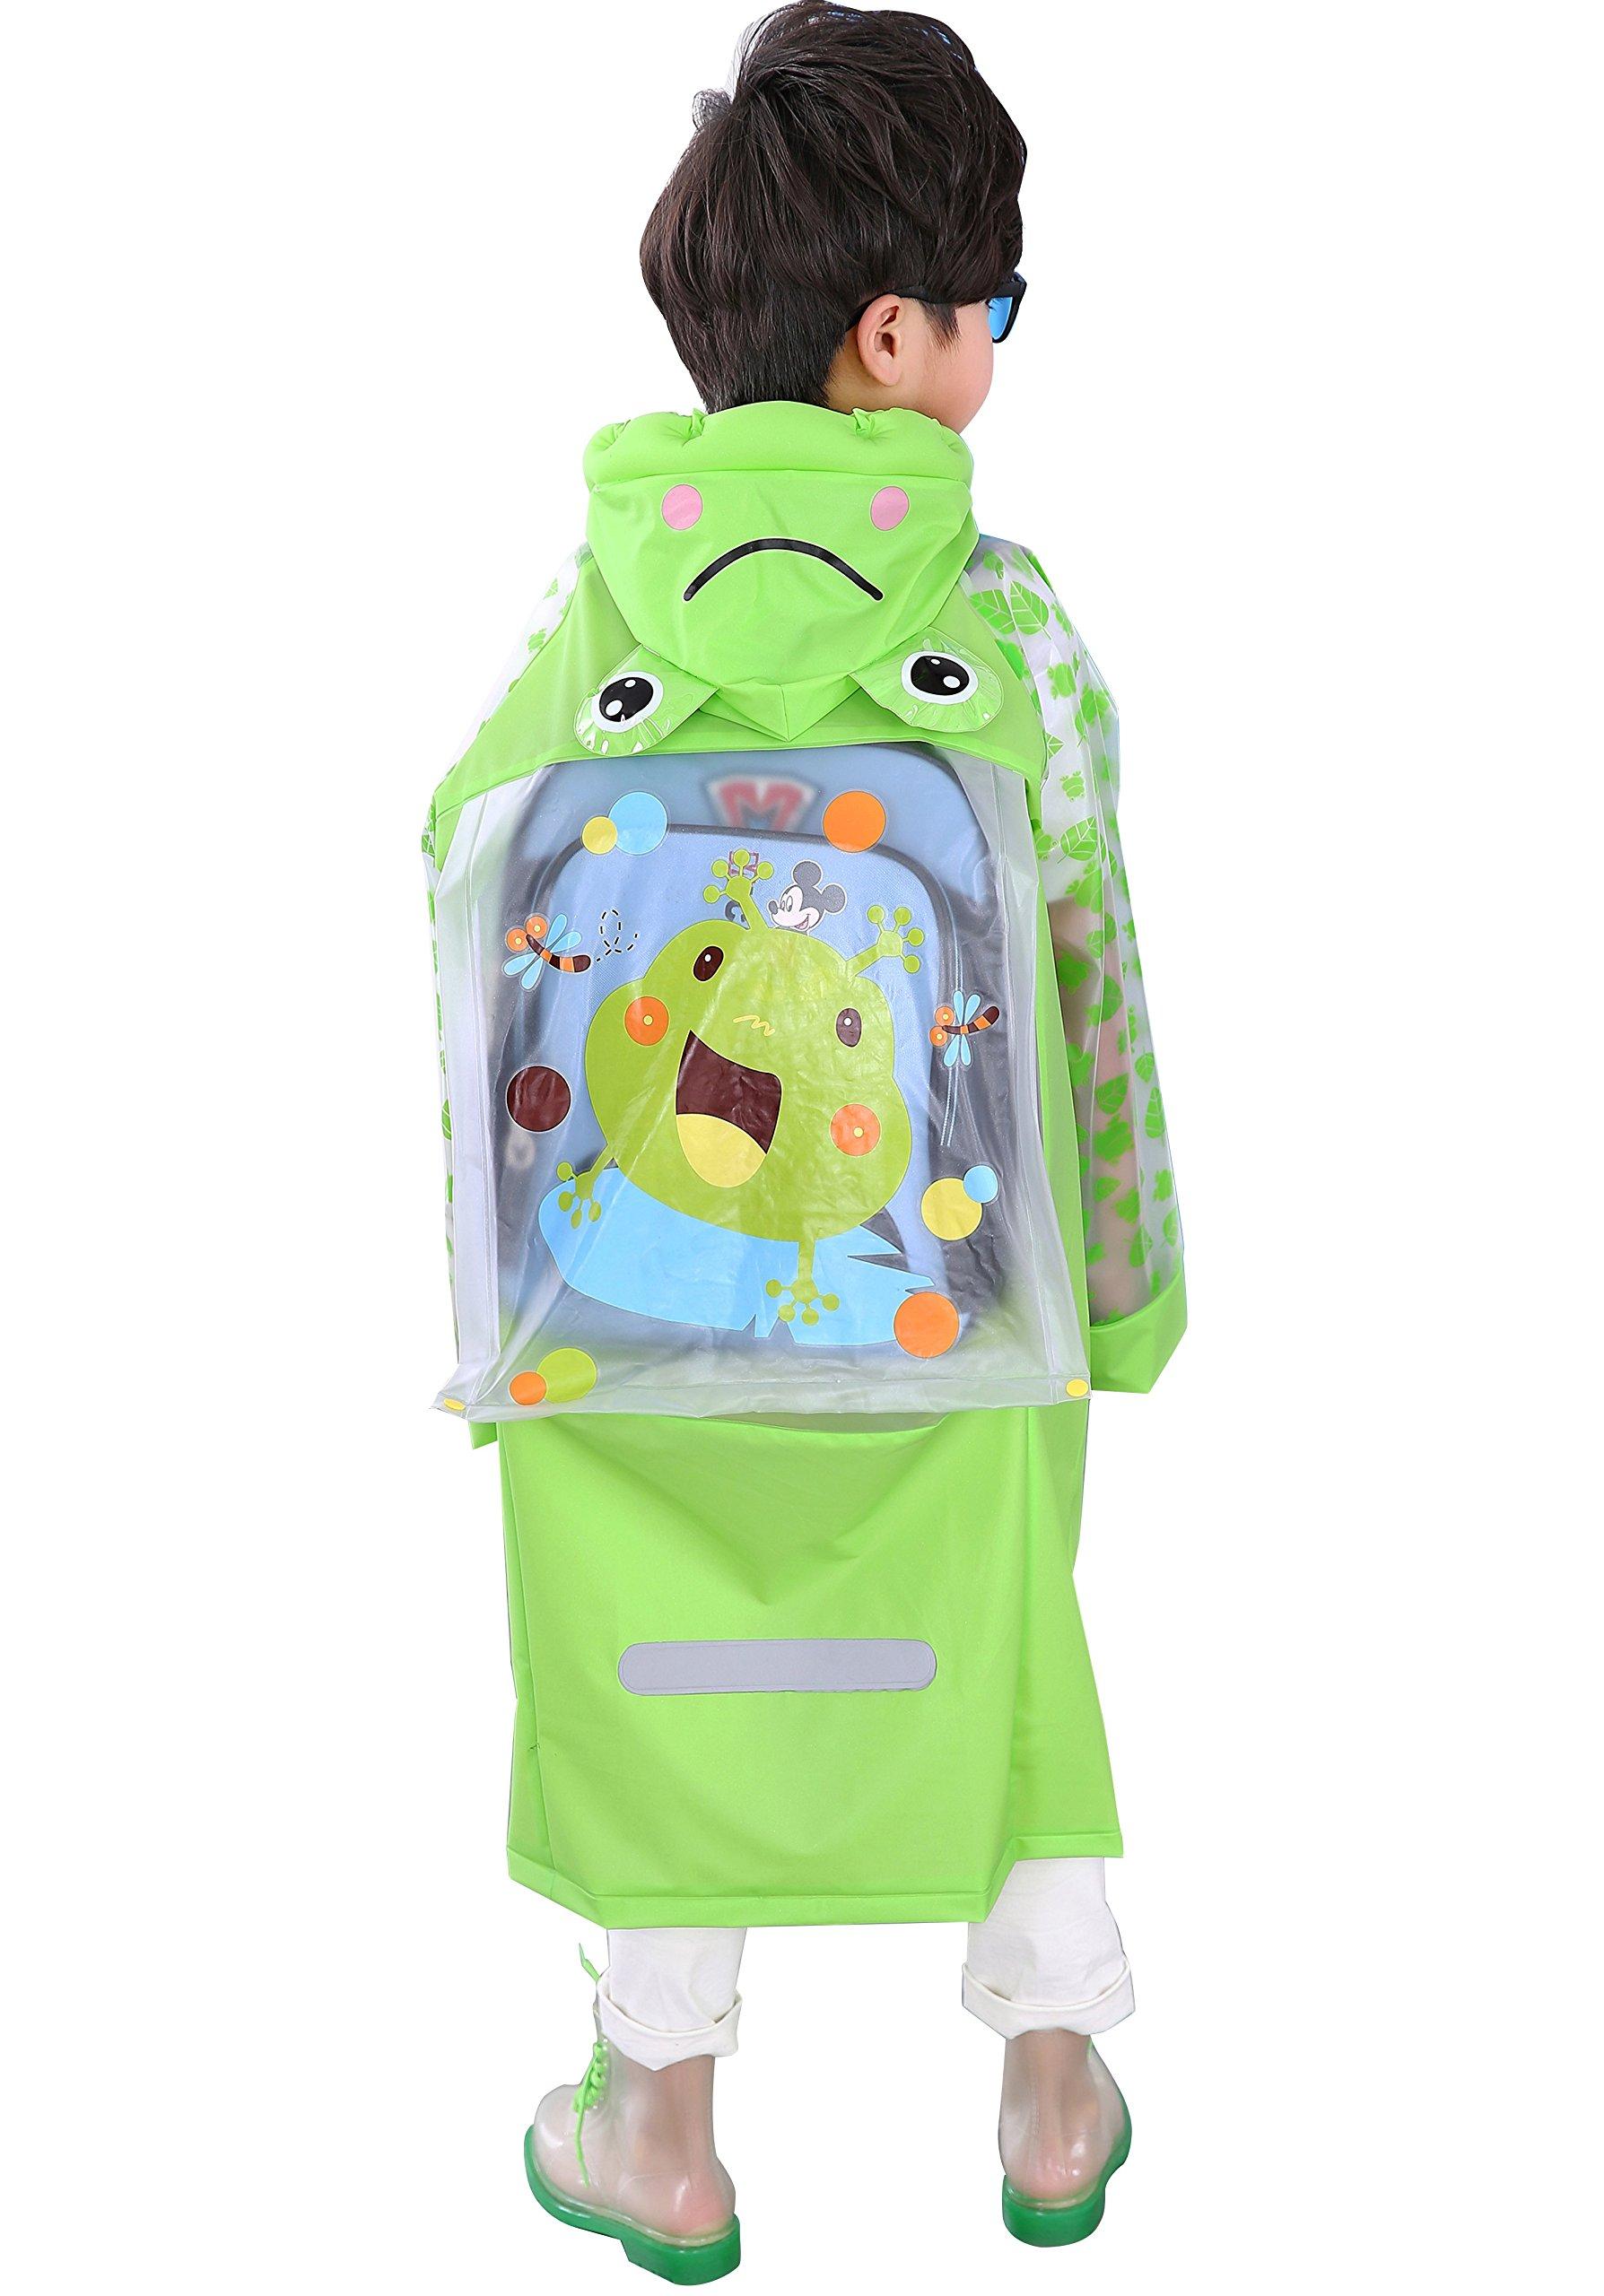 Aircee Waterproof Rain Coat Slicker for Kids, Girls, Boys, Poncho Jacket Gear (XL (Fit 4'3''~4'7'' Height), Green Frog)